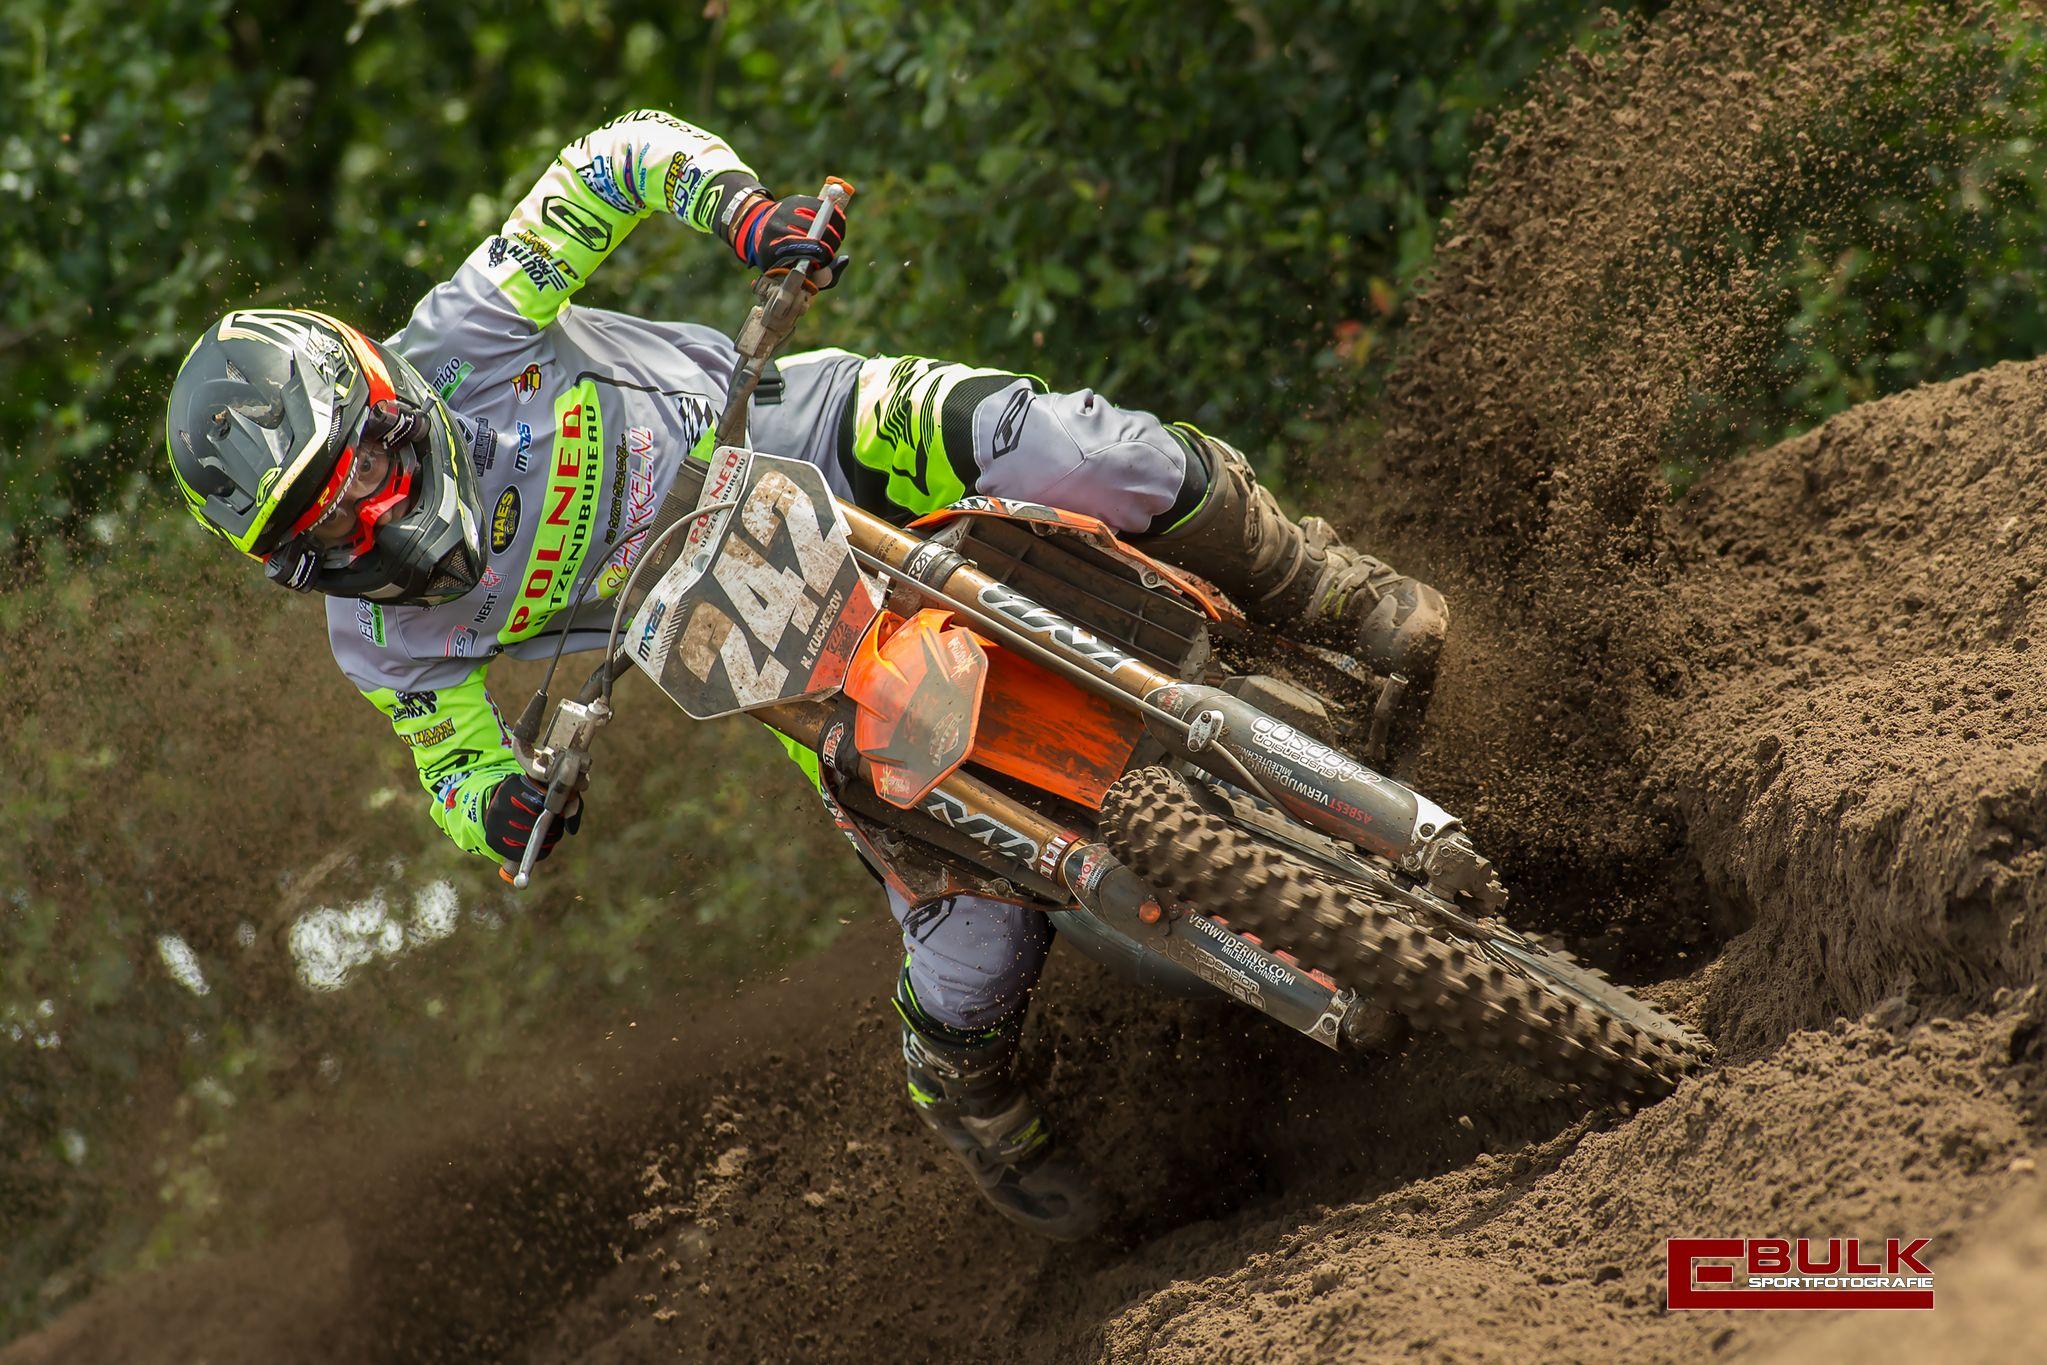 eebs2229-ed_bulk_sportfotografie